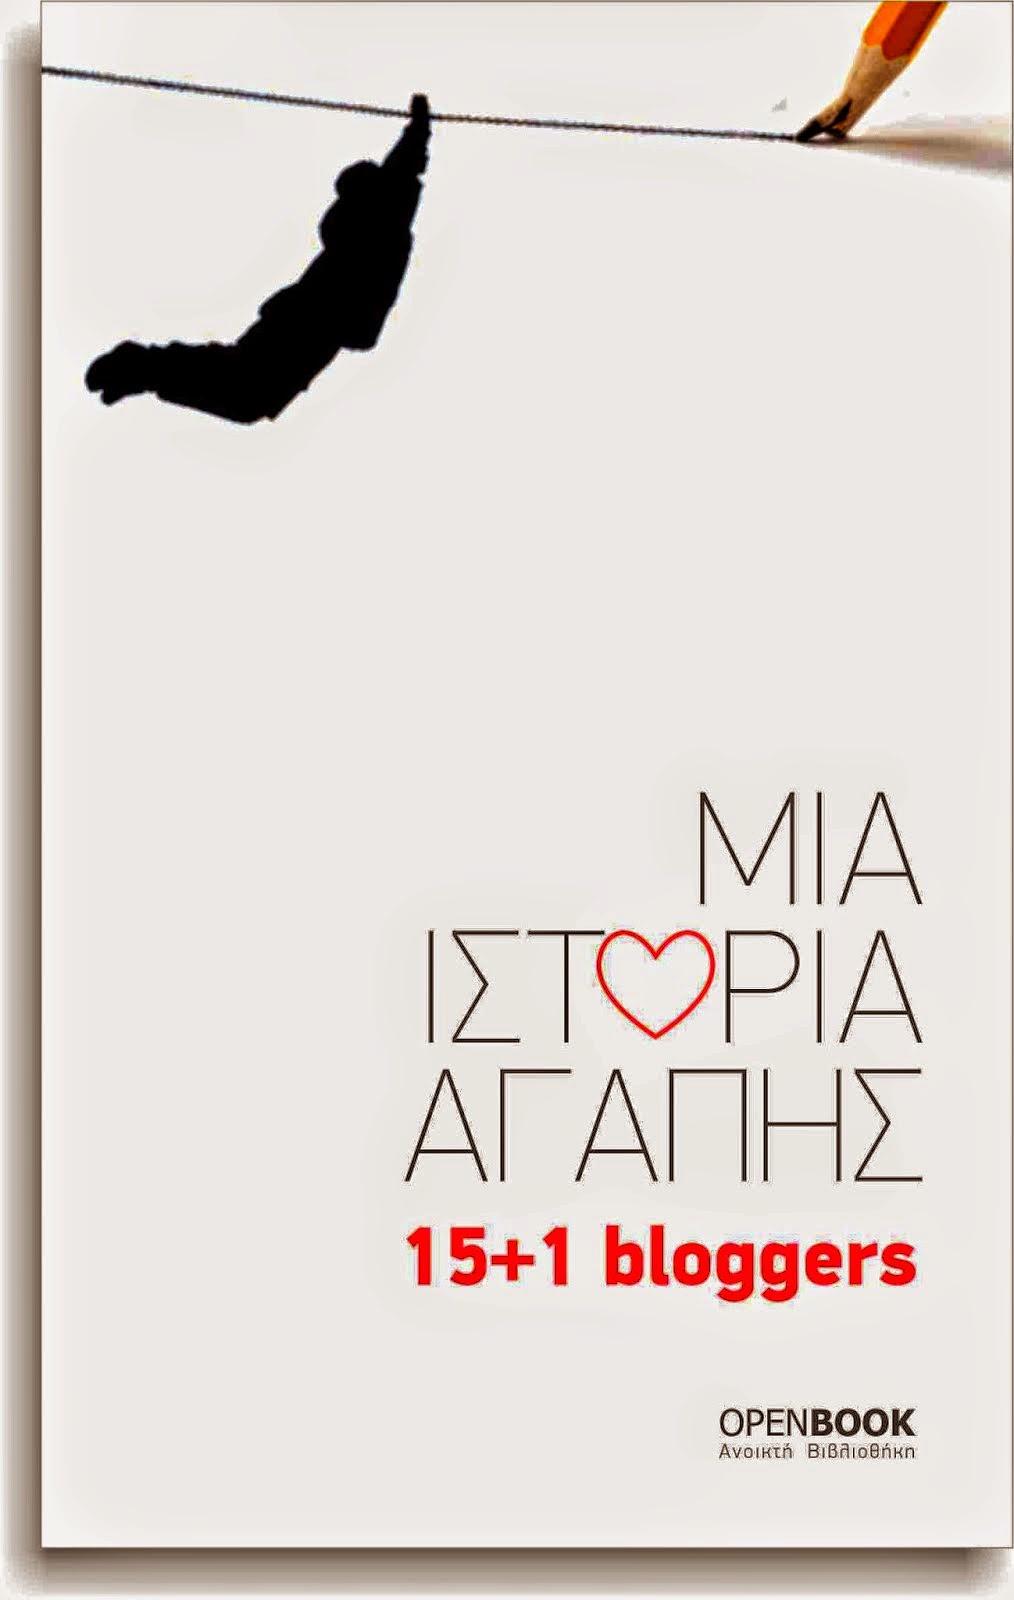 15+1 bloggers - ΜΙΑ ΙΣΤΟΡΙΑ ΑΓΑΠΗΣ